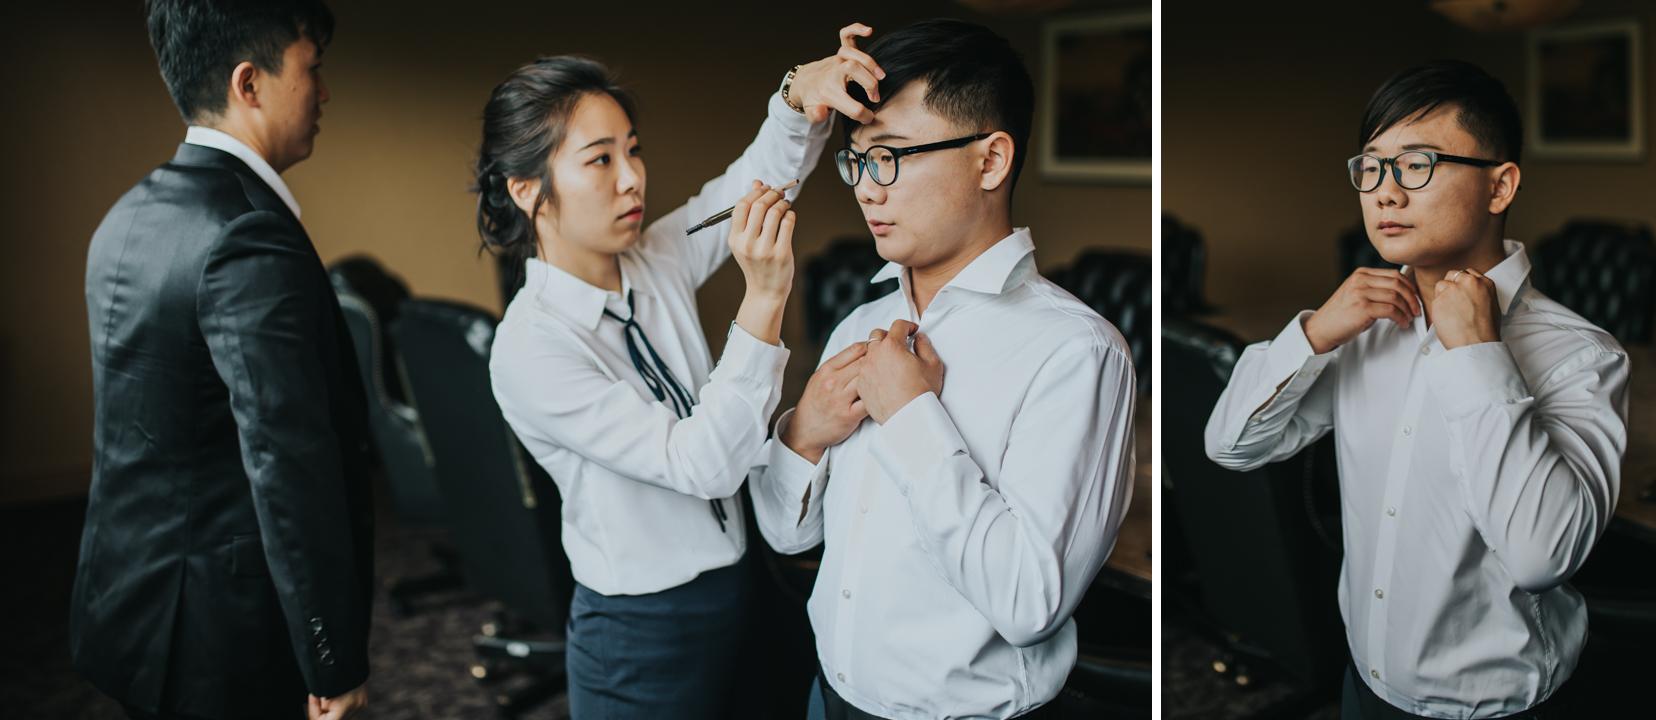 LGP-ann-arbor-eagle-crest-wedding-004.jpg